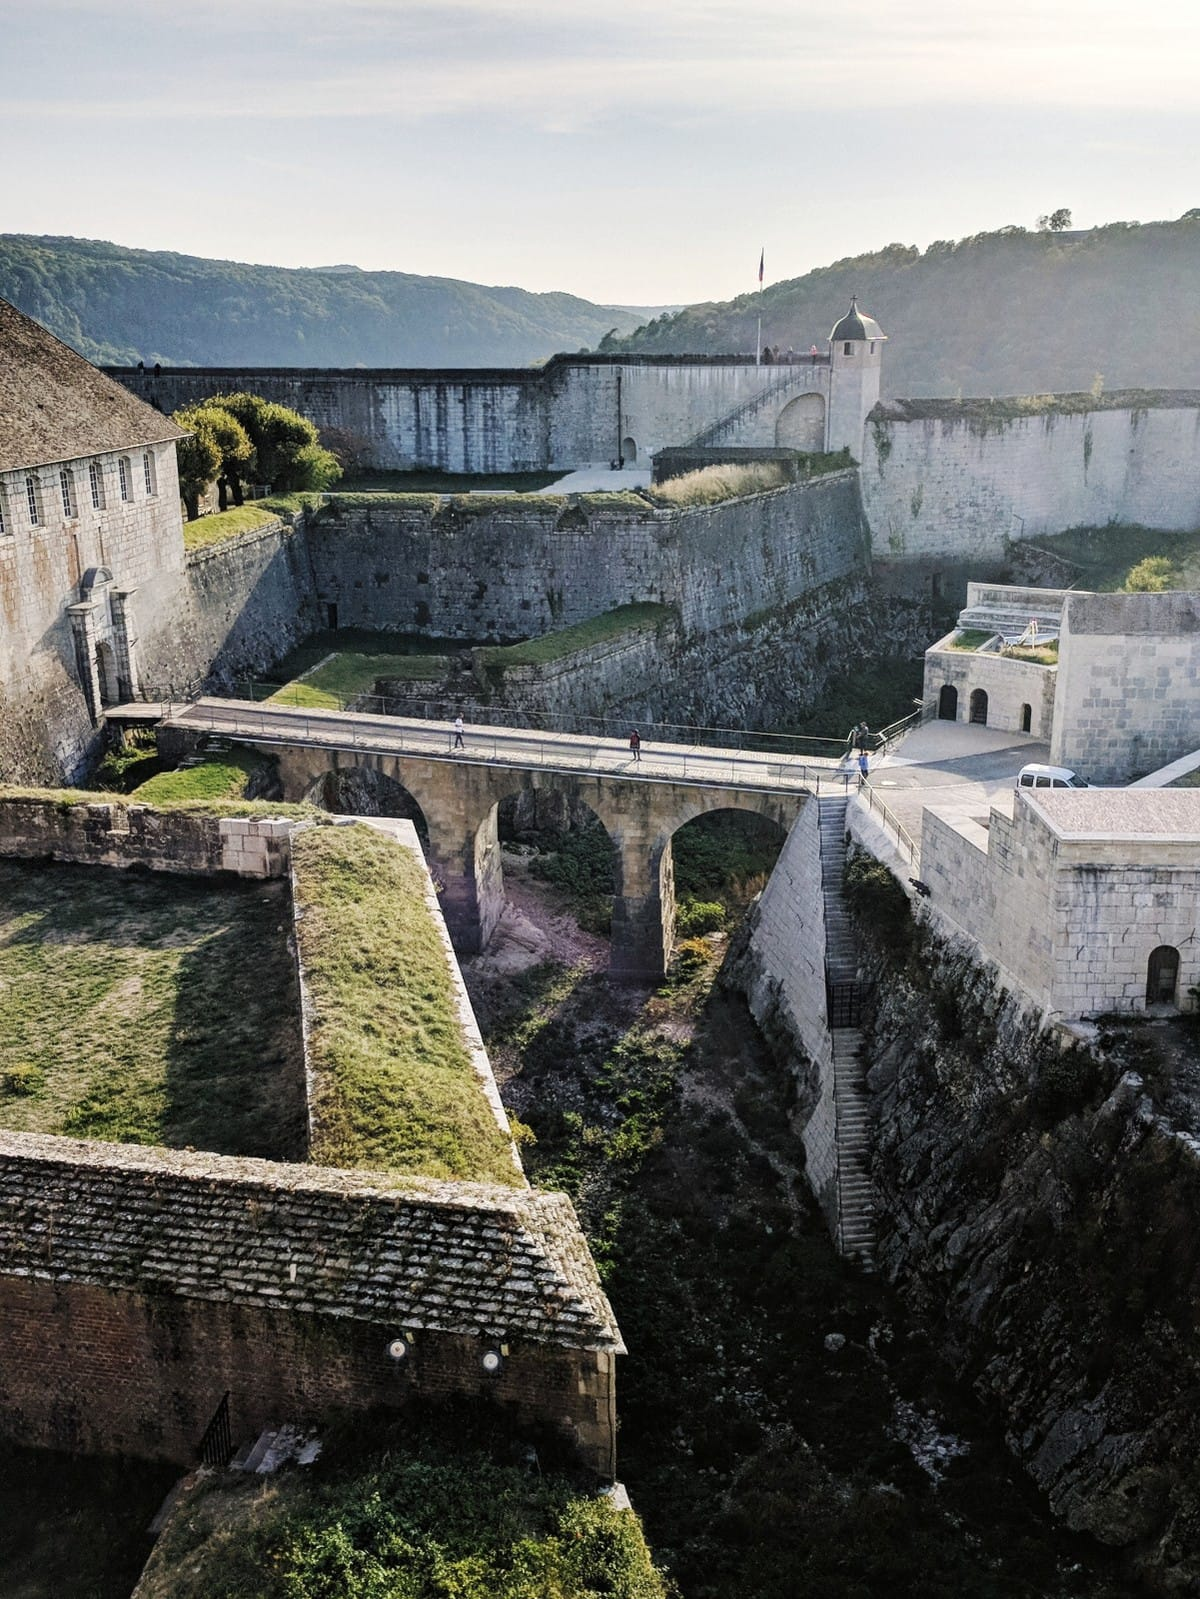 Citadelle de Besançon fort walls